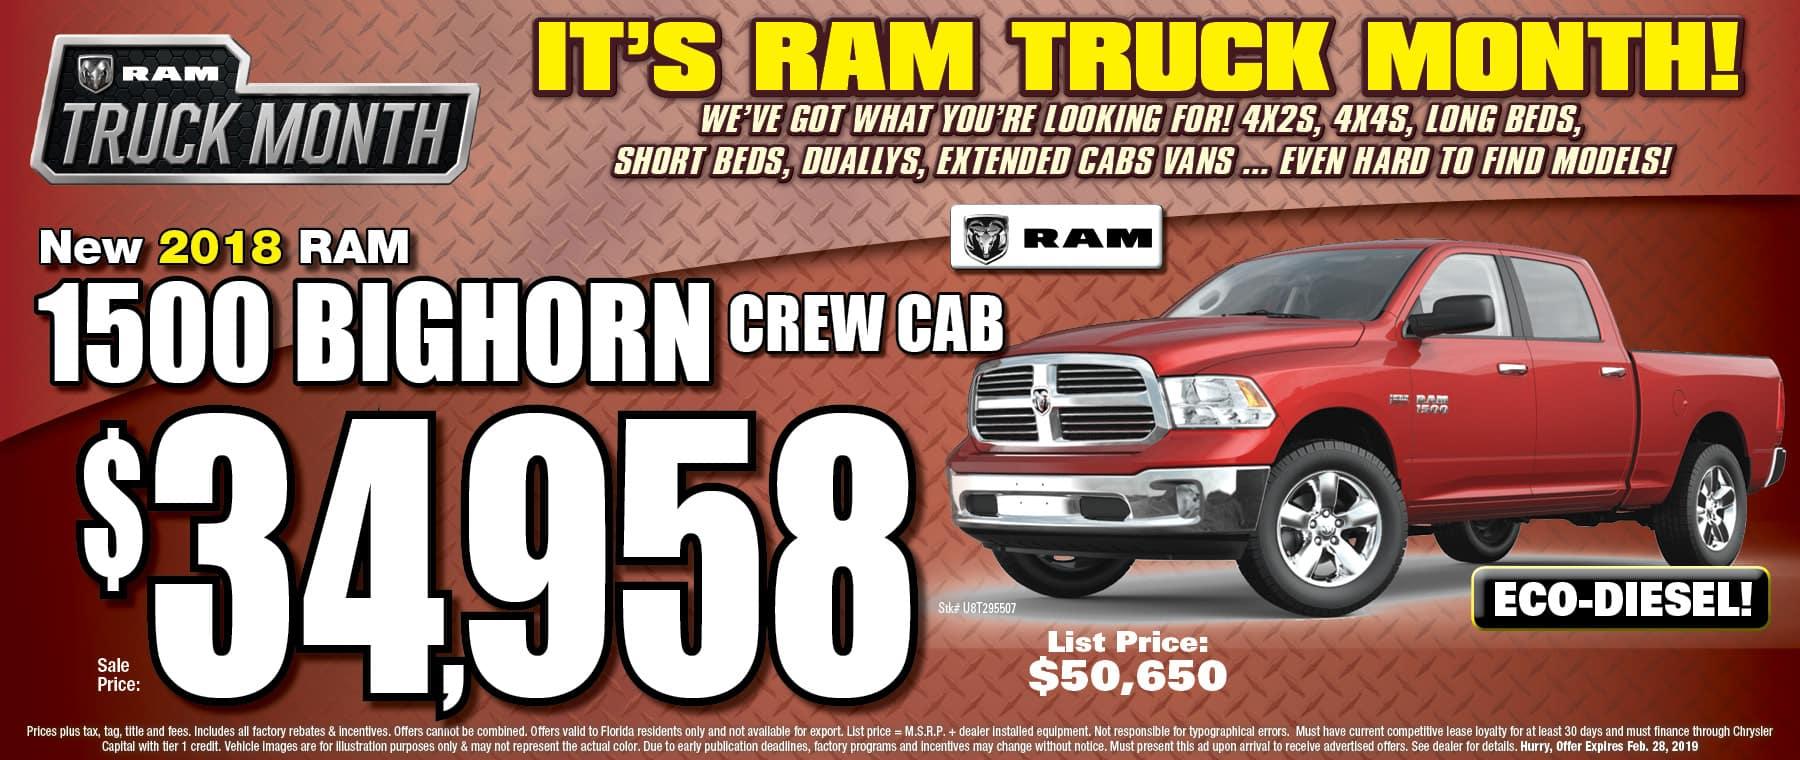 New @018 RAM Bighorn! - University Dodge RAM!